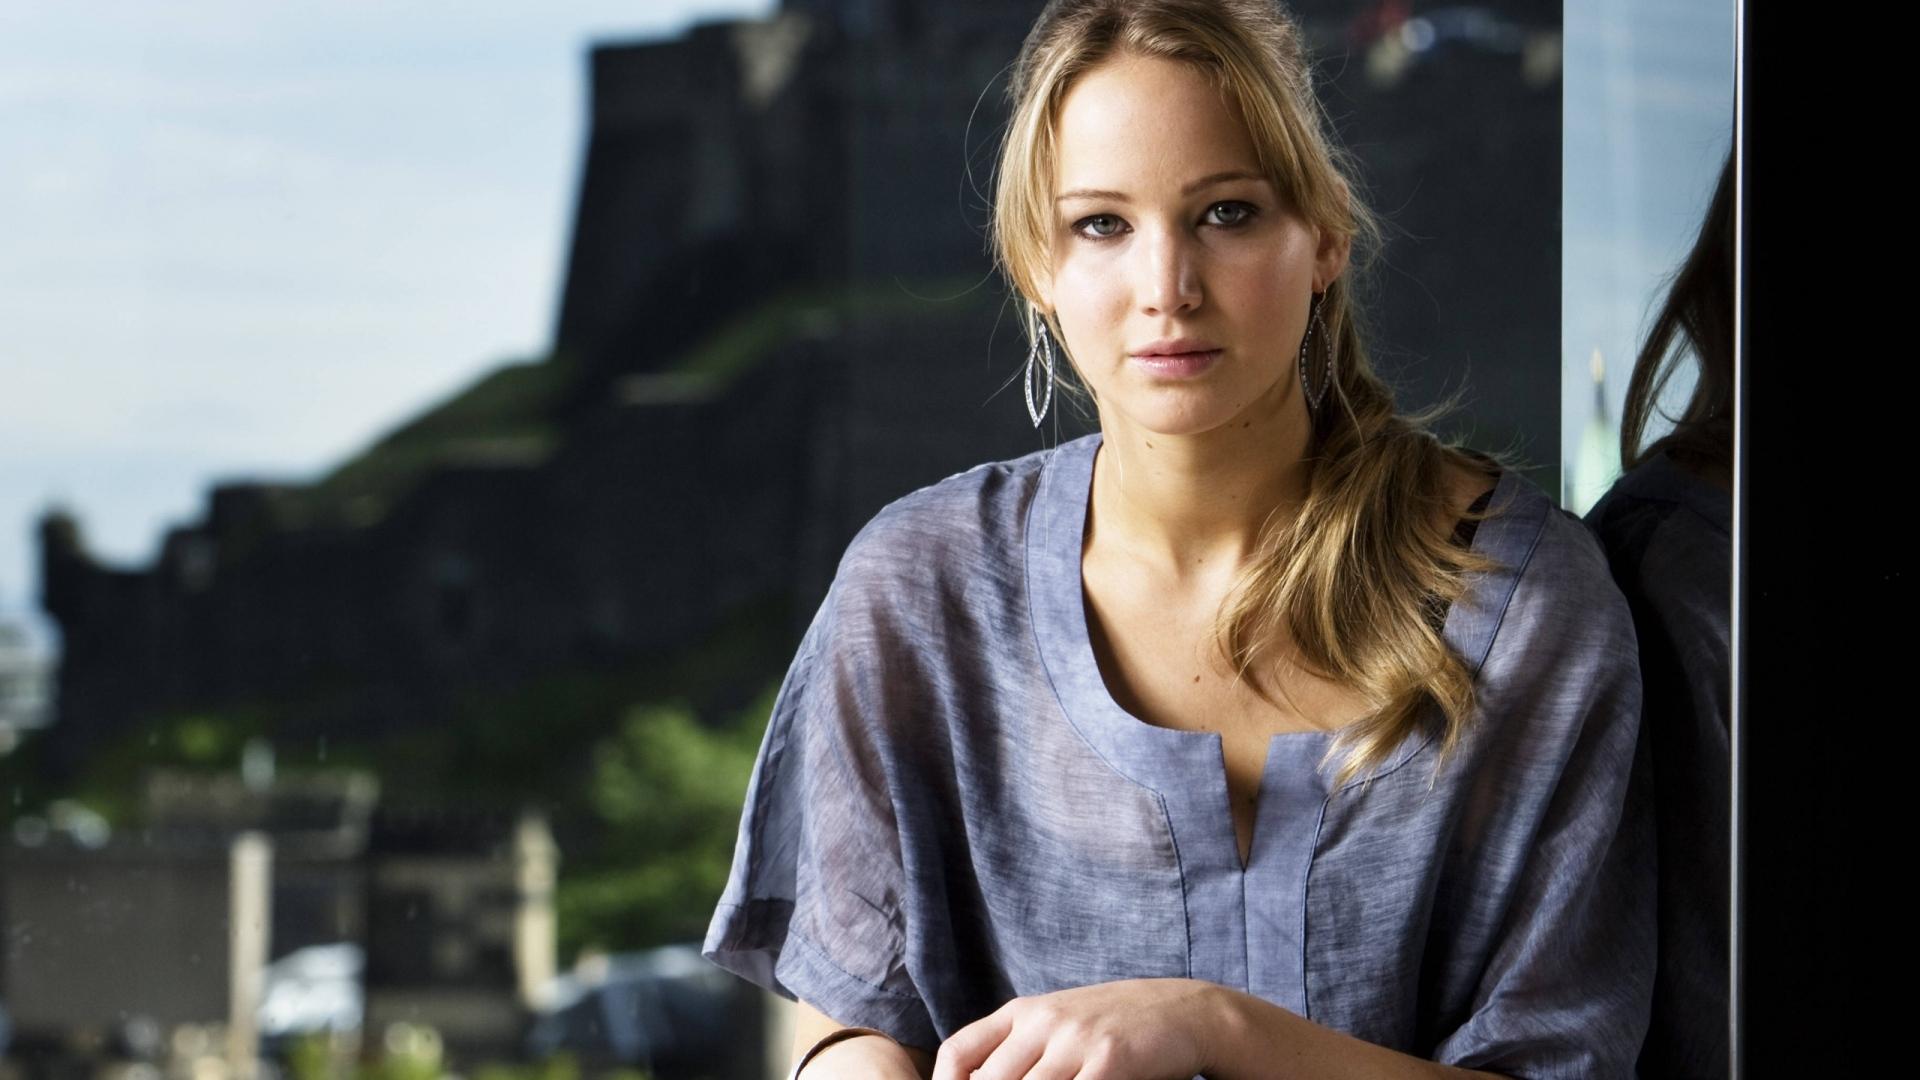 Jennifer Lawrence Beautiful HD Wallpaper 2015 1920x1080